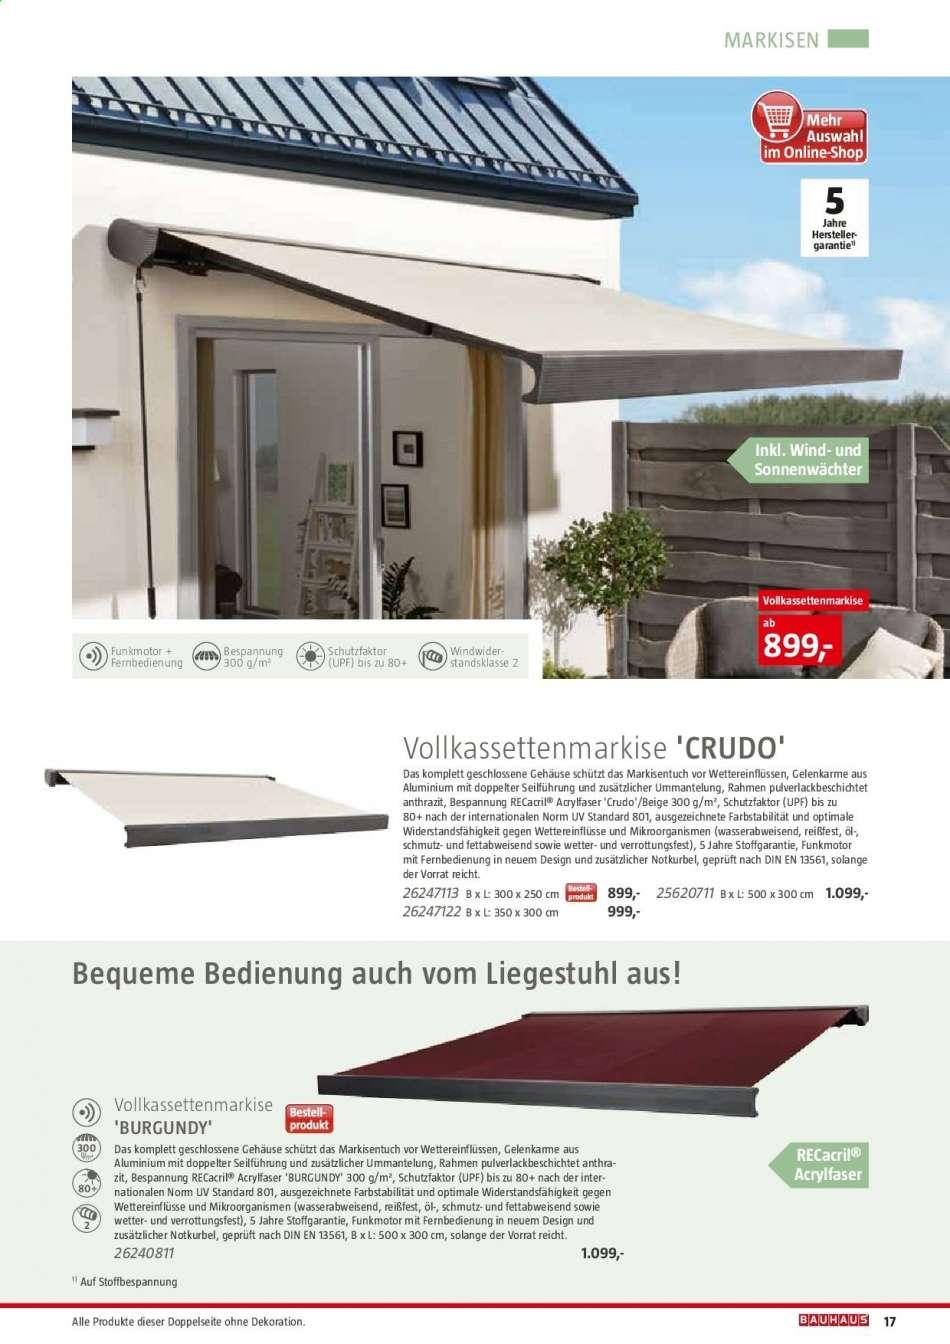 Full Size of Bauhaus Liegestuhl Holz Auflage Relax Klapp Design Aktuelles Prospekt 922019 31122019 Rabatt Kompass Garten Fenster Wohnzimmer Bauhaus Liegestuhl